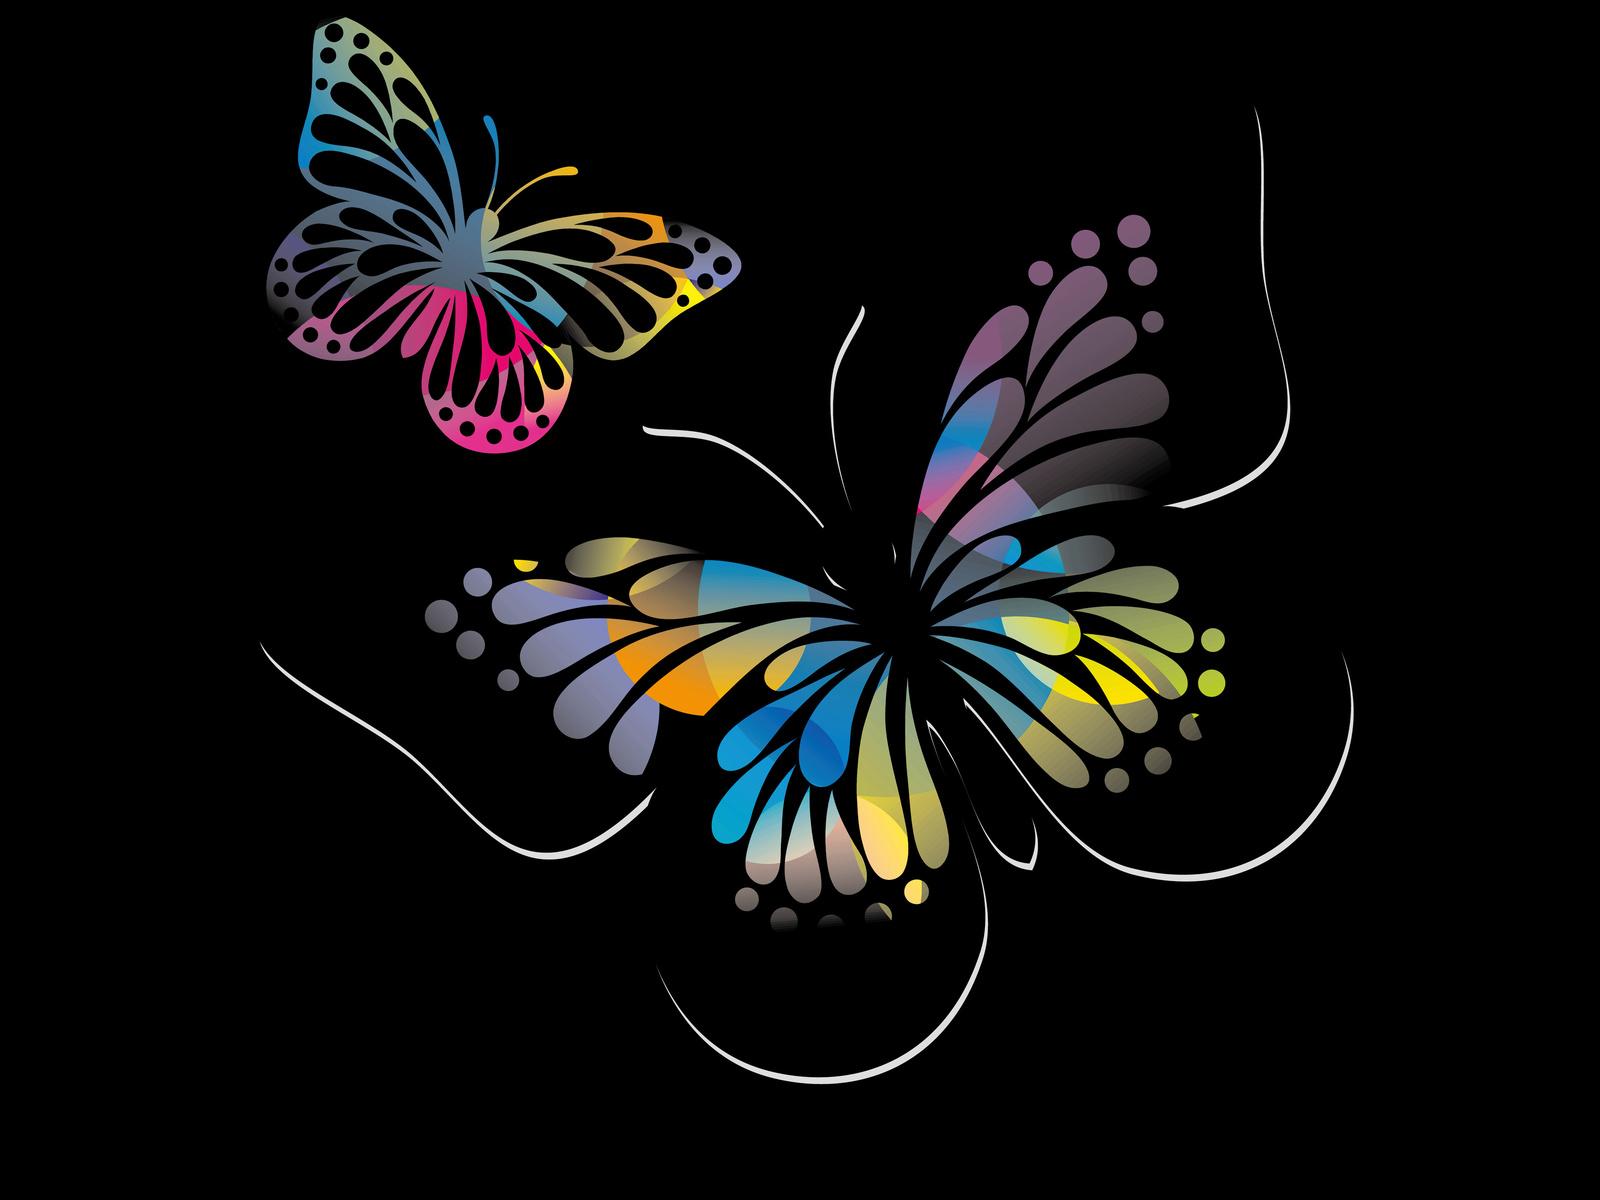 бабочки, черный, фон